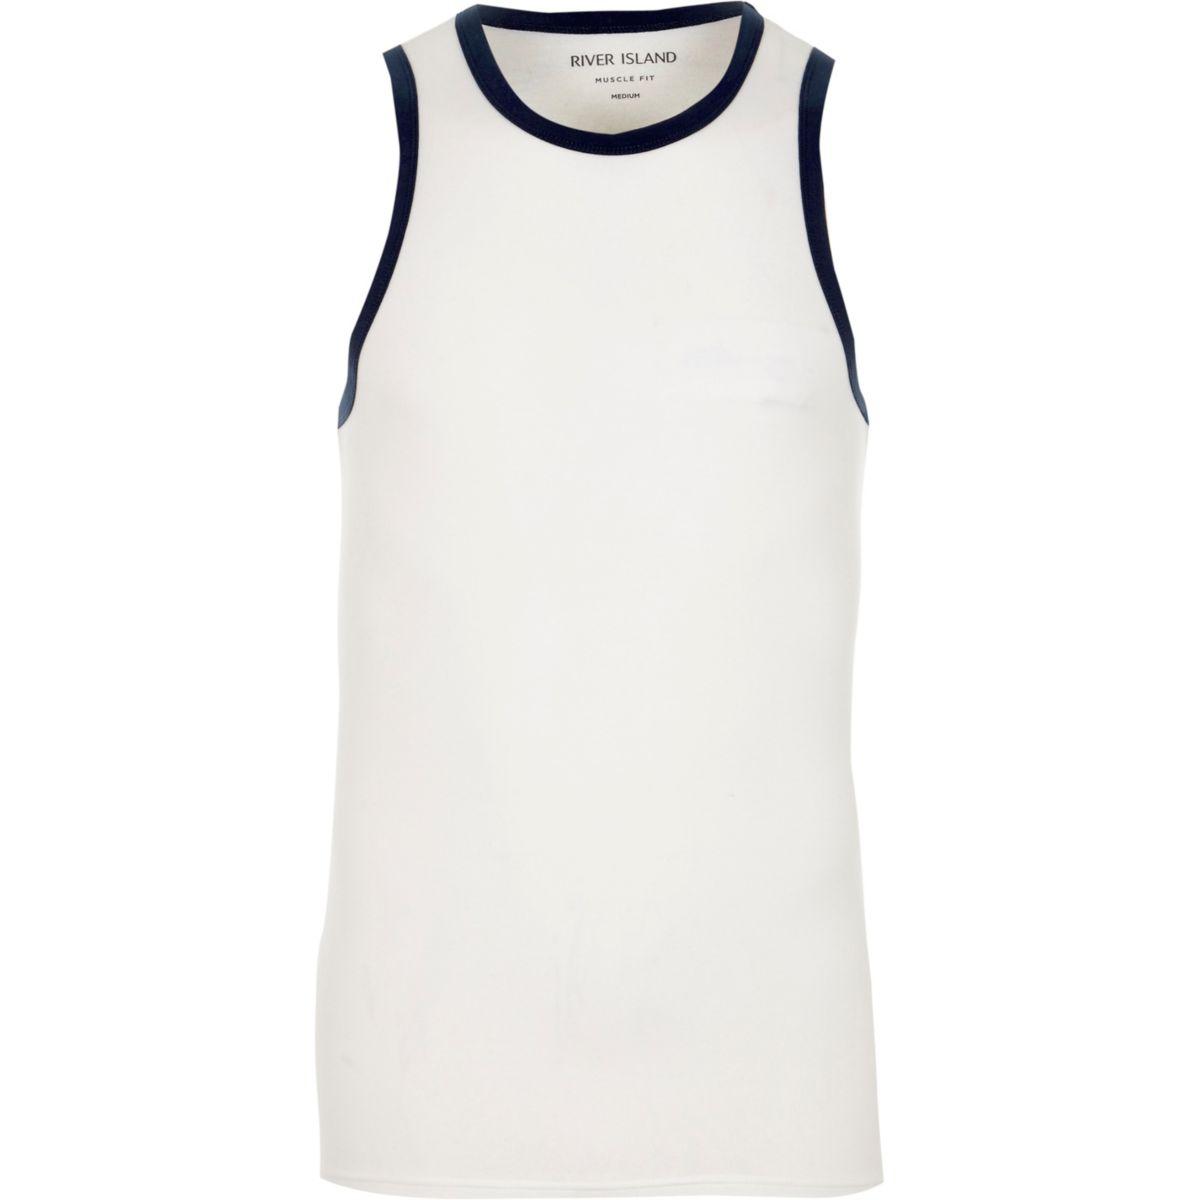 White muscle fit ringer vest